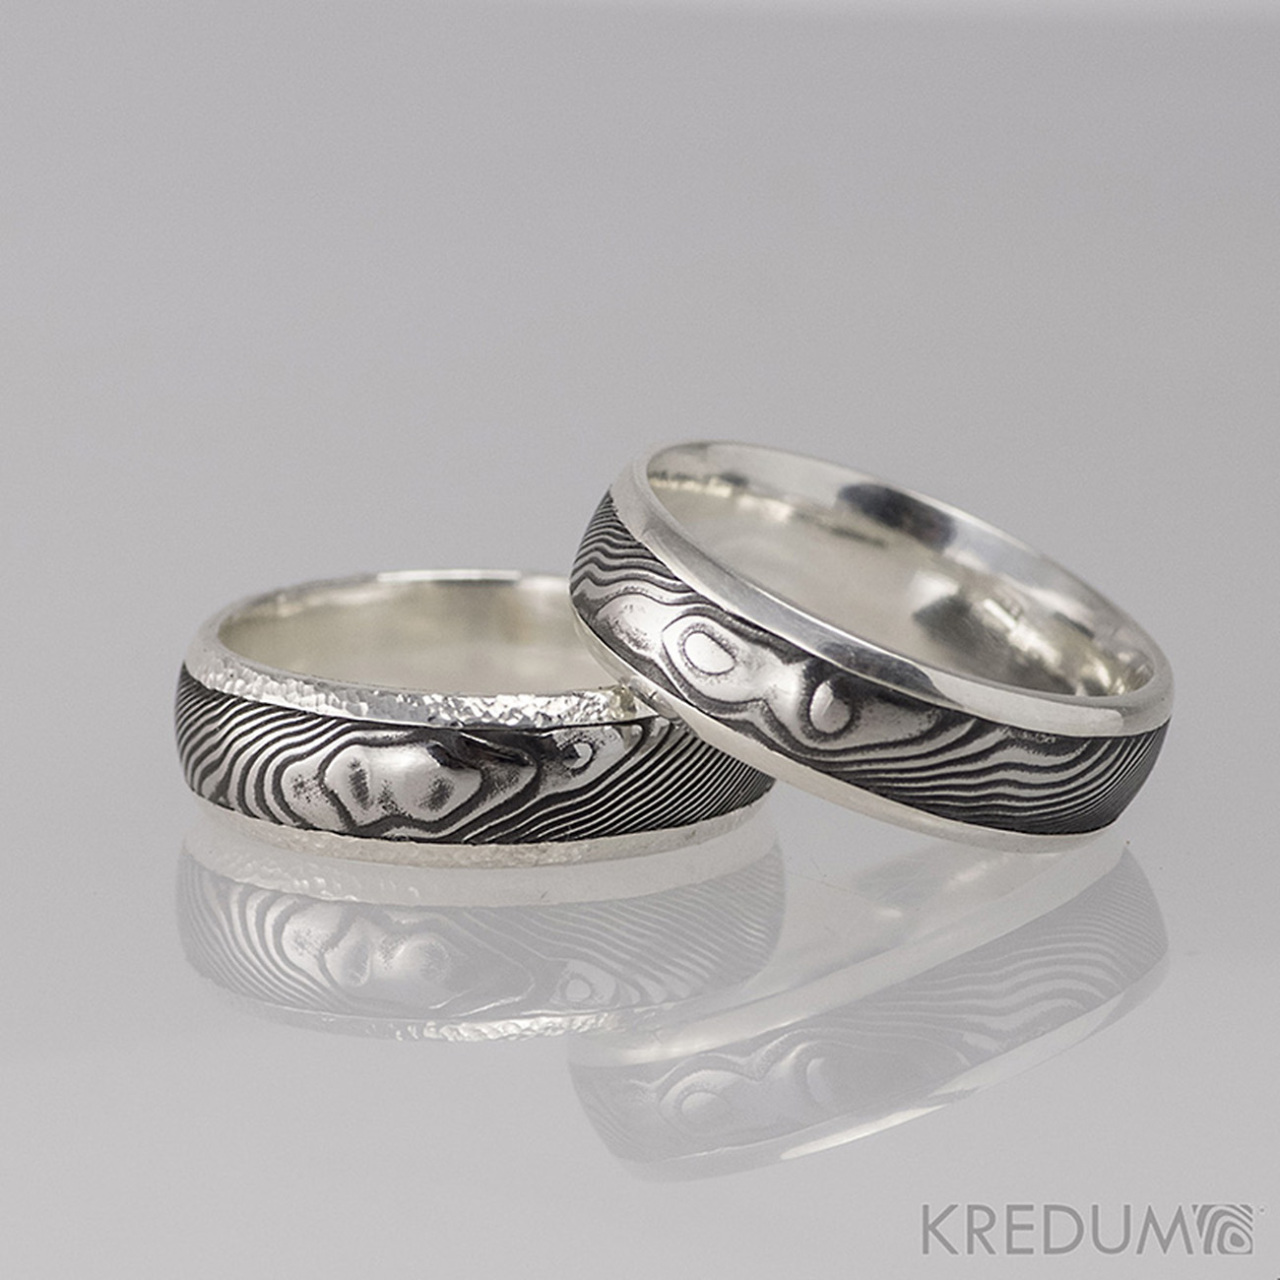 Stribrny Snubni Prsten A Damasteel Luna Drevo Vyroba Hand Made